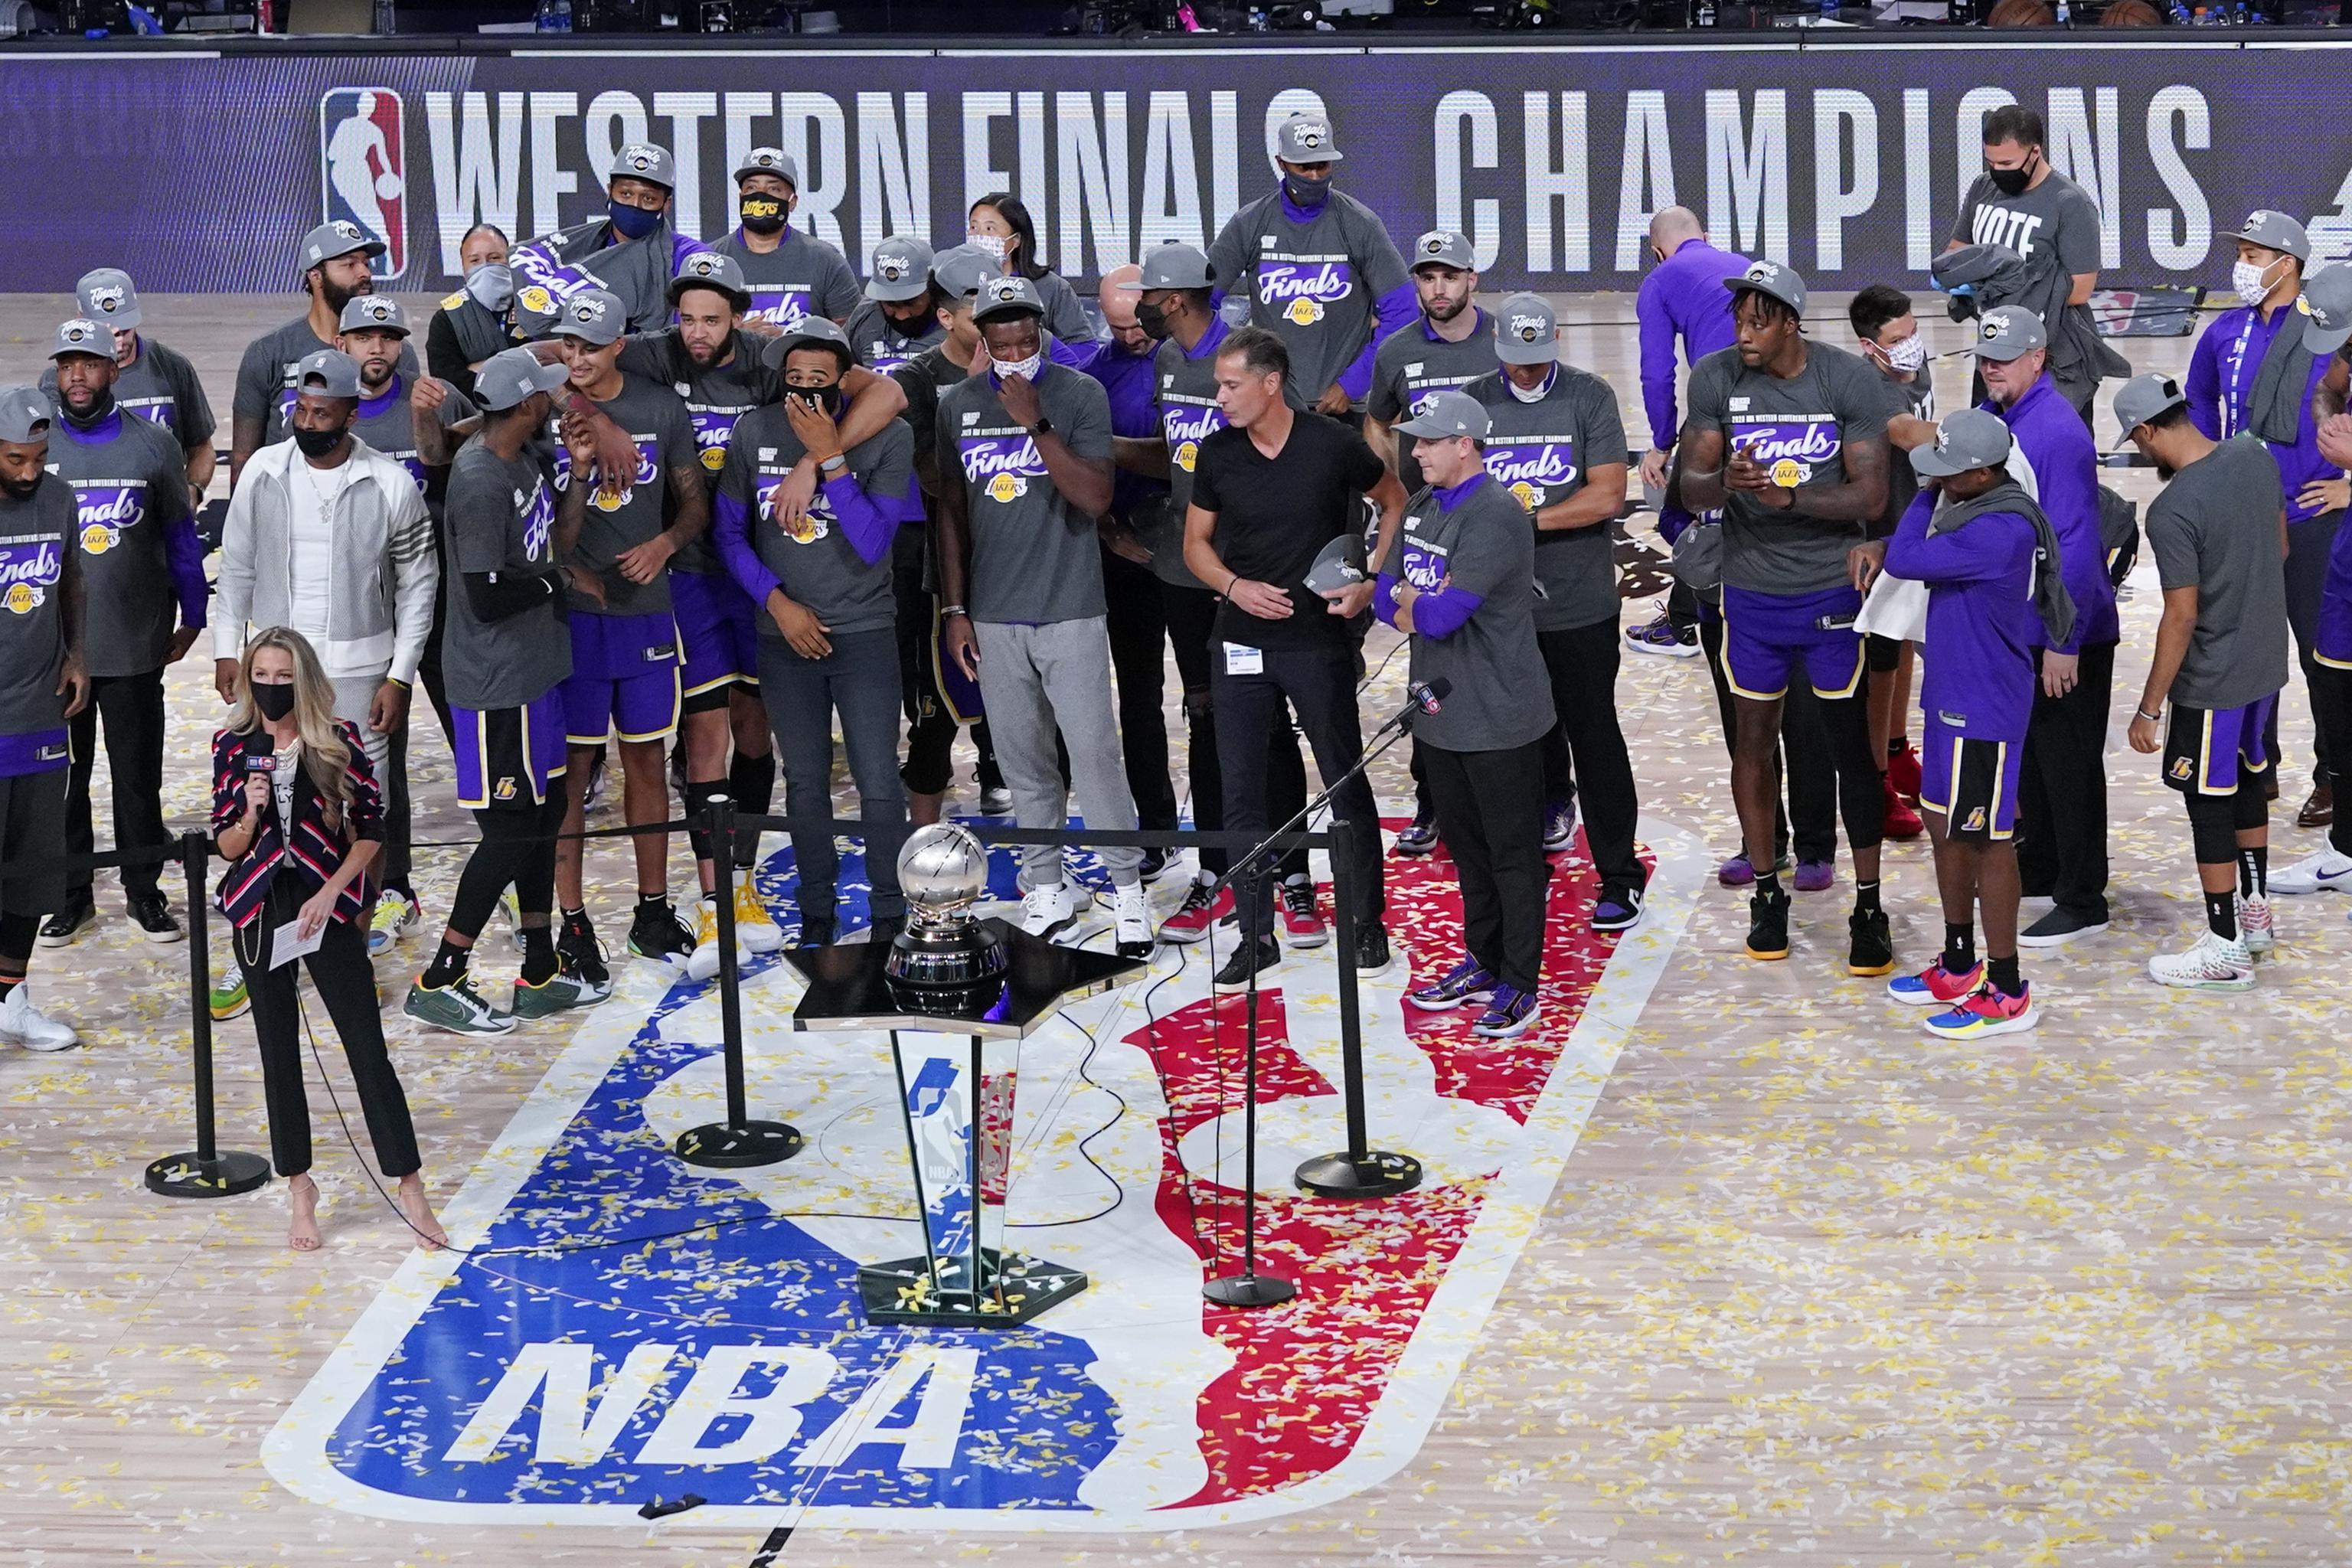 Nba Finals 2020 Early Odds Schedule As Lakers Await Celtics Vs Heat Bleacher Report Latest News Videos And Highlights